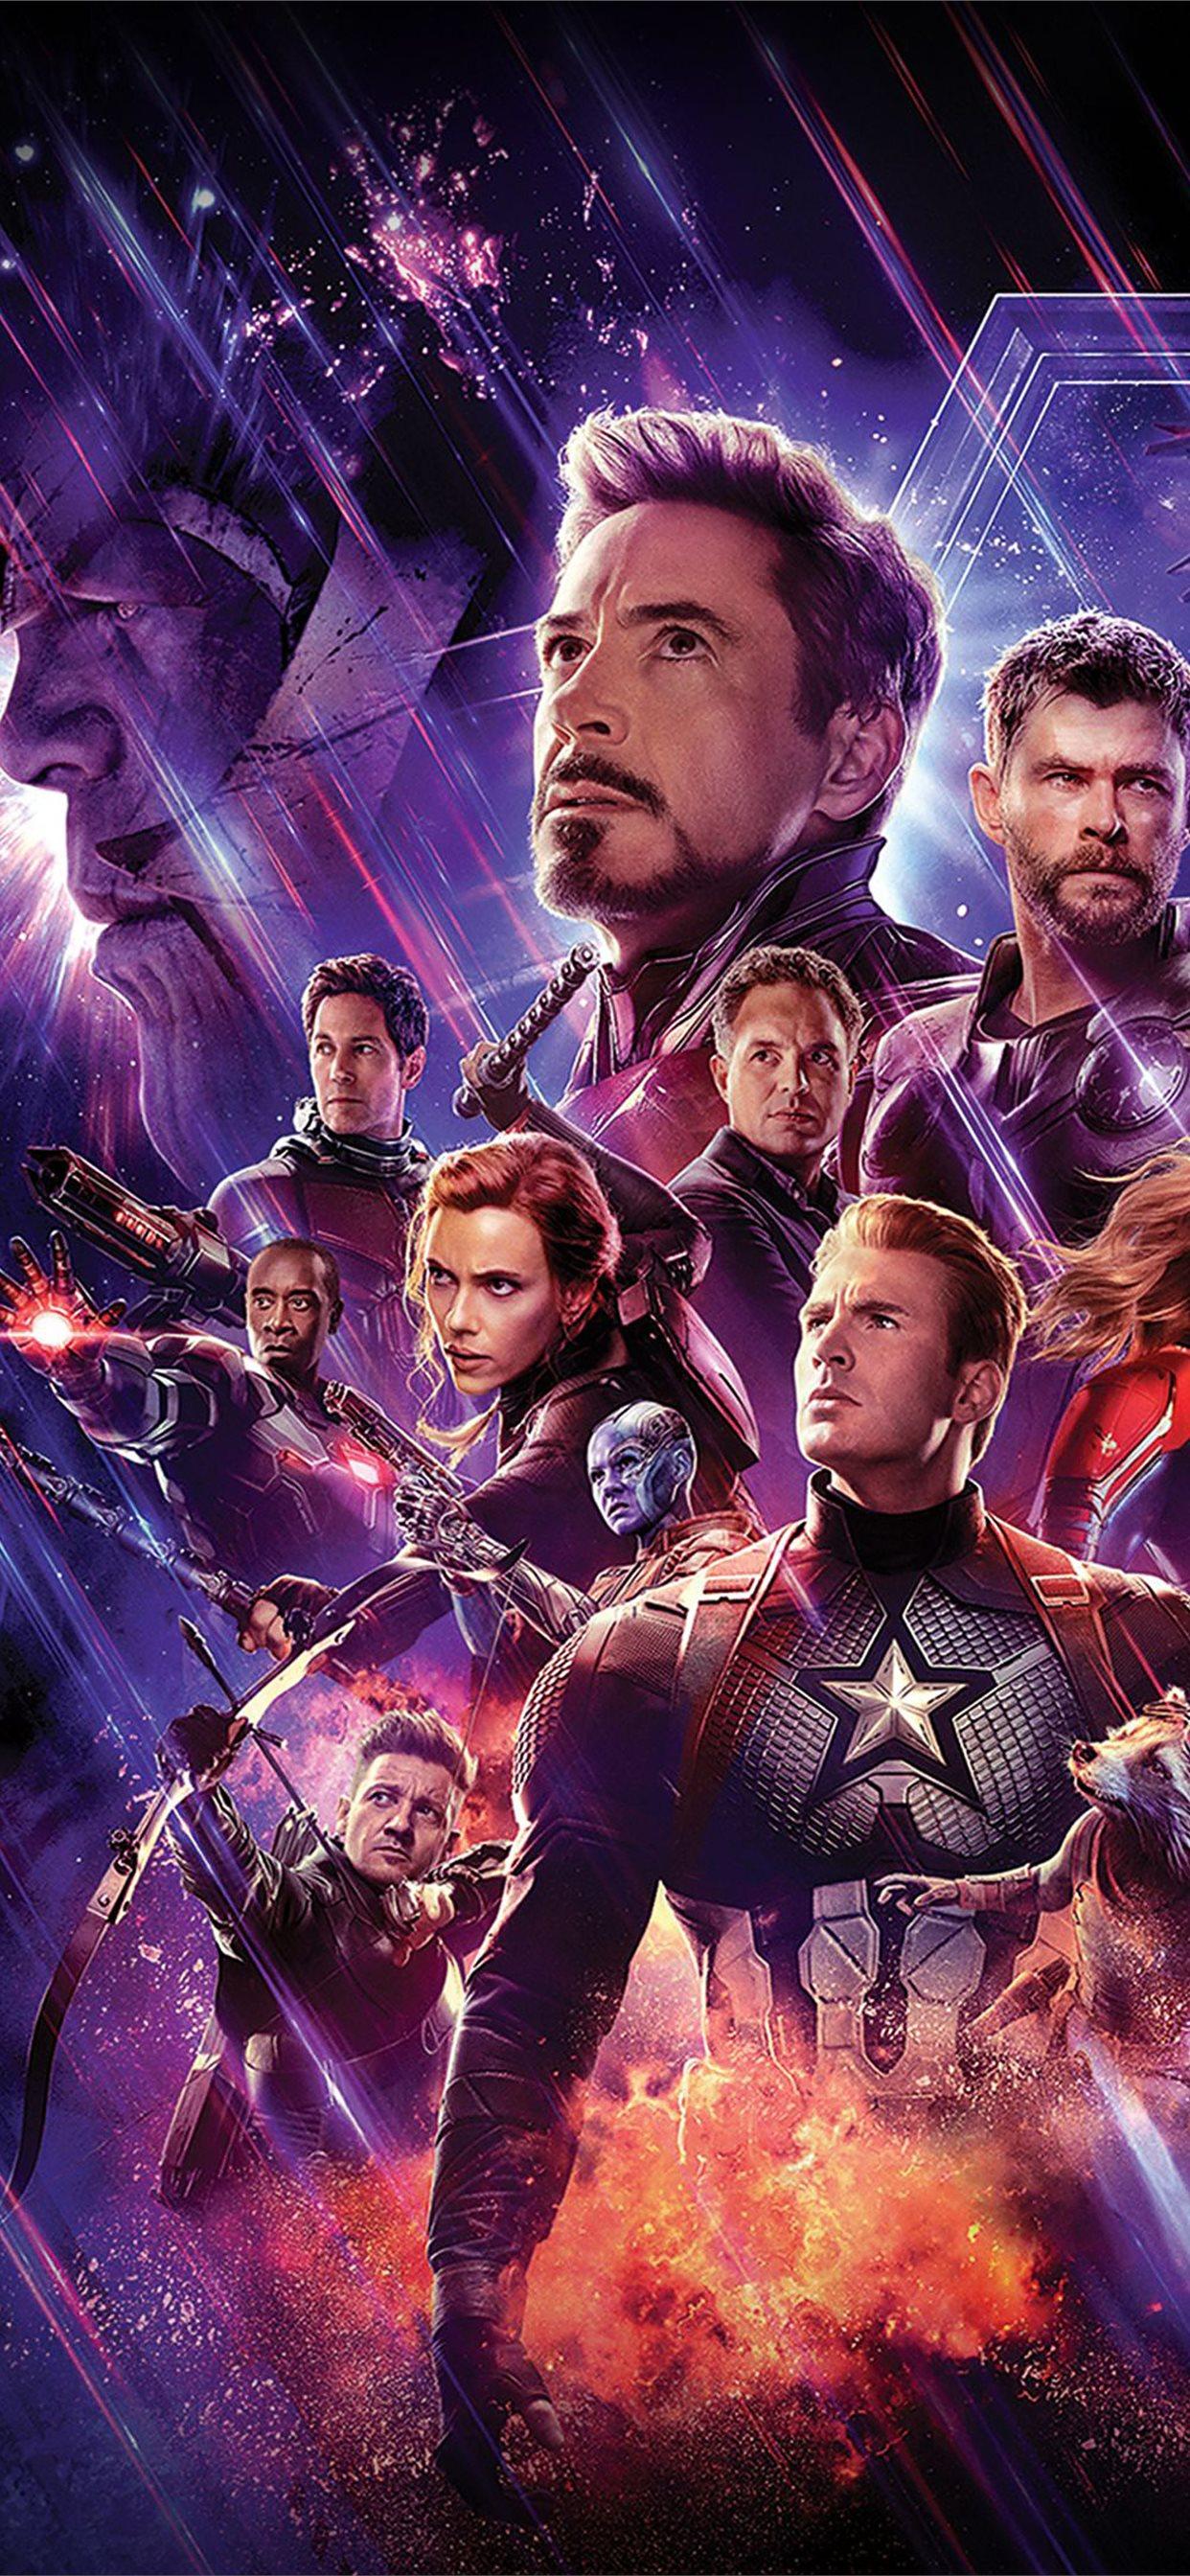 Iphone Xs Max Avengers Wallpaper : iphone, avengers, wallpaper, Avengers, Banner, IPhone, Wallpapers, Download